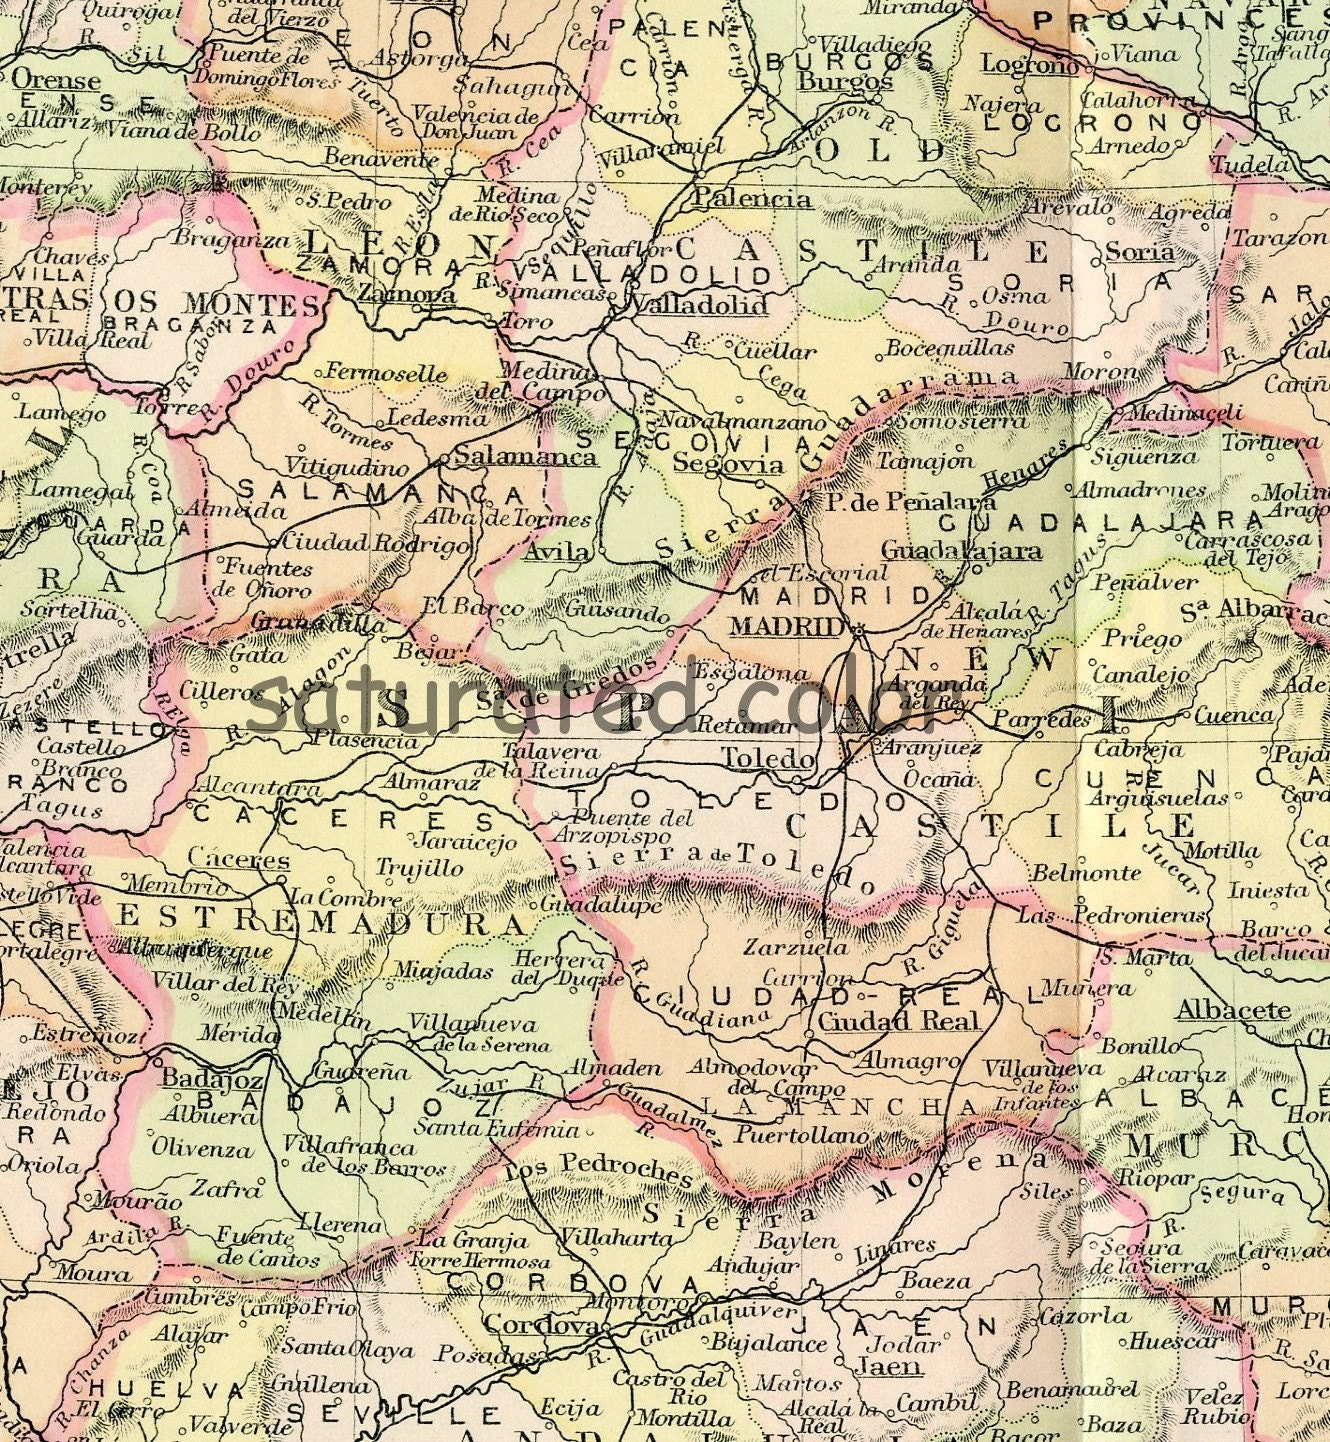 Moron Spain Map.Spain Portugal Map Original 1895antique Vintage Map Spain Etsy